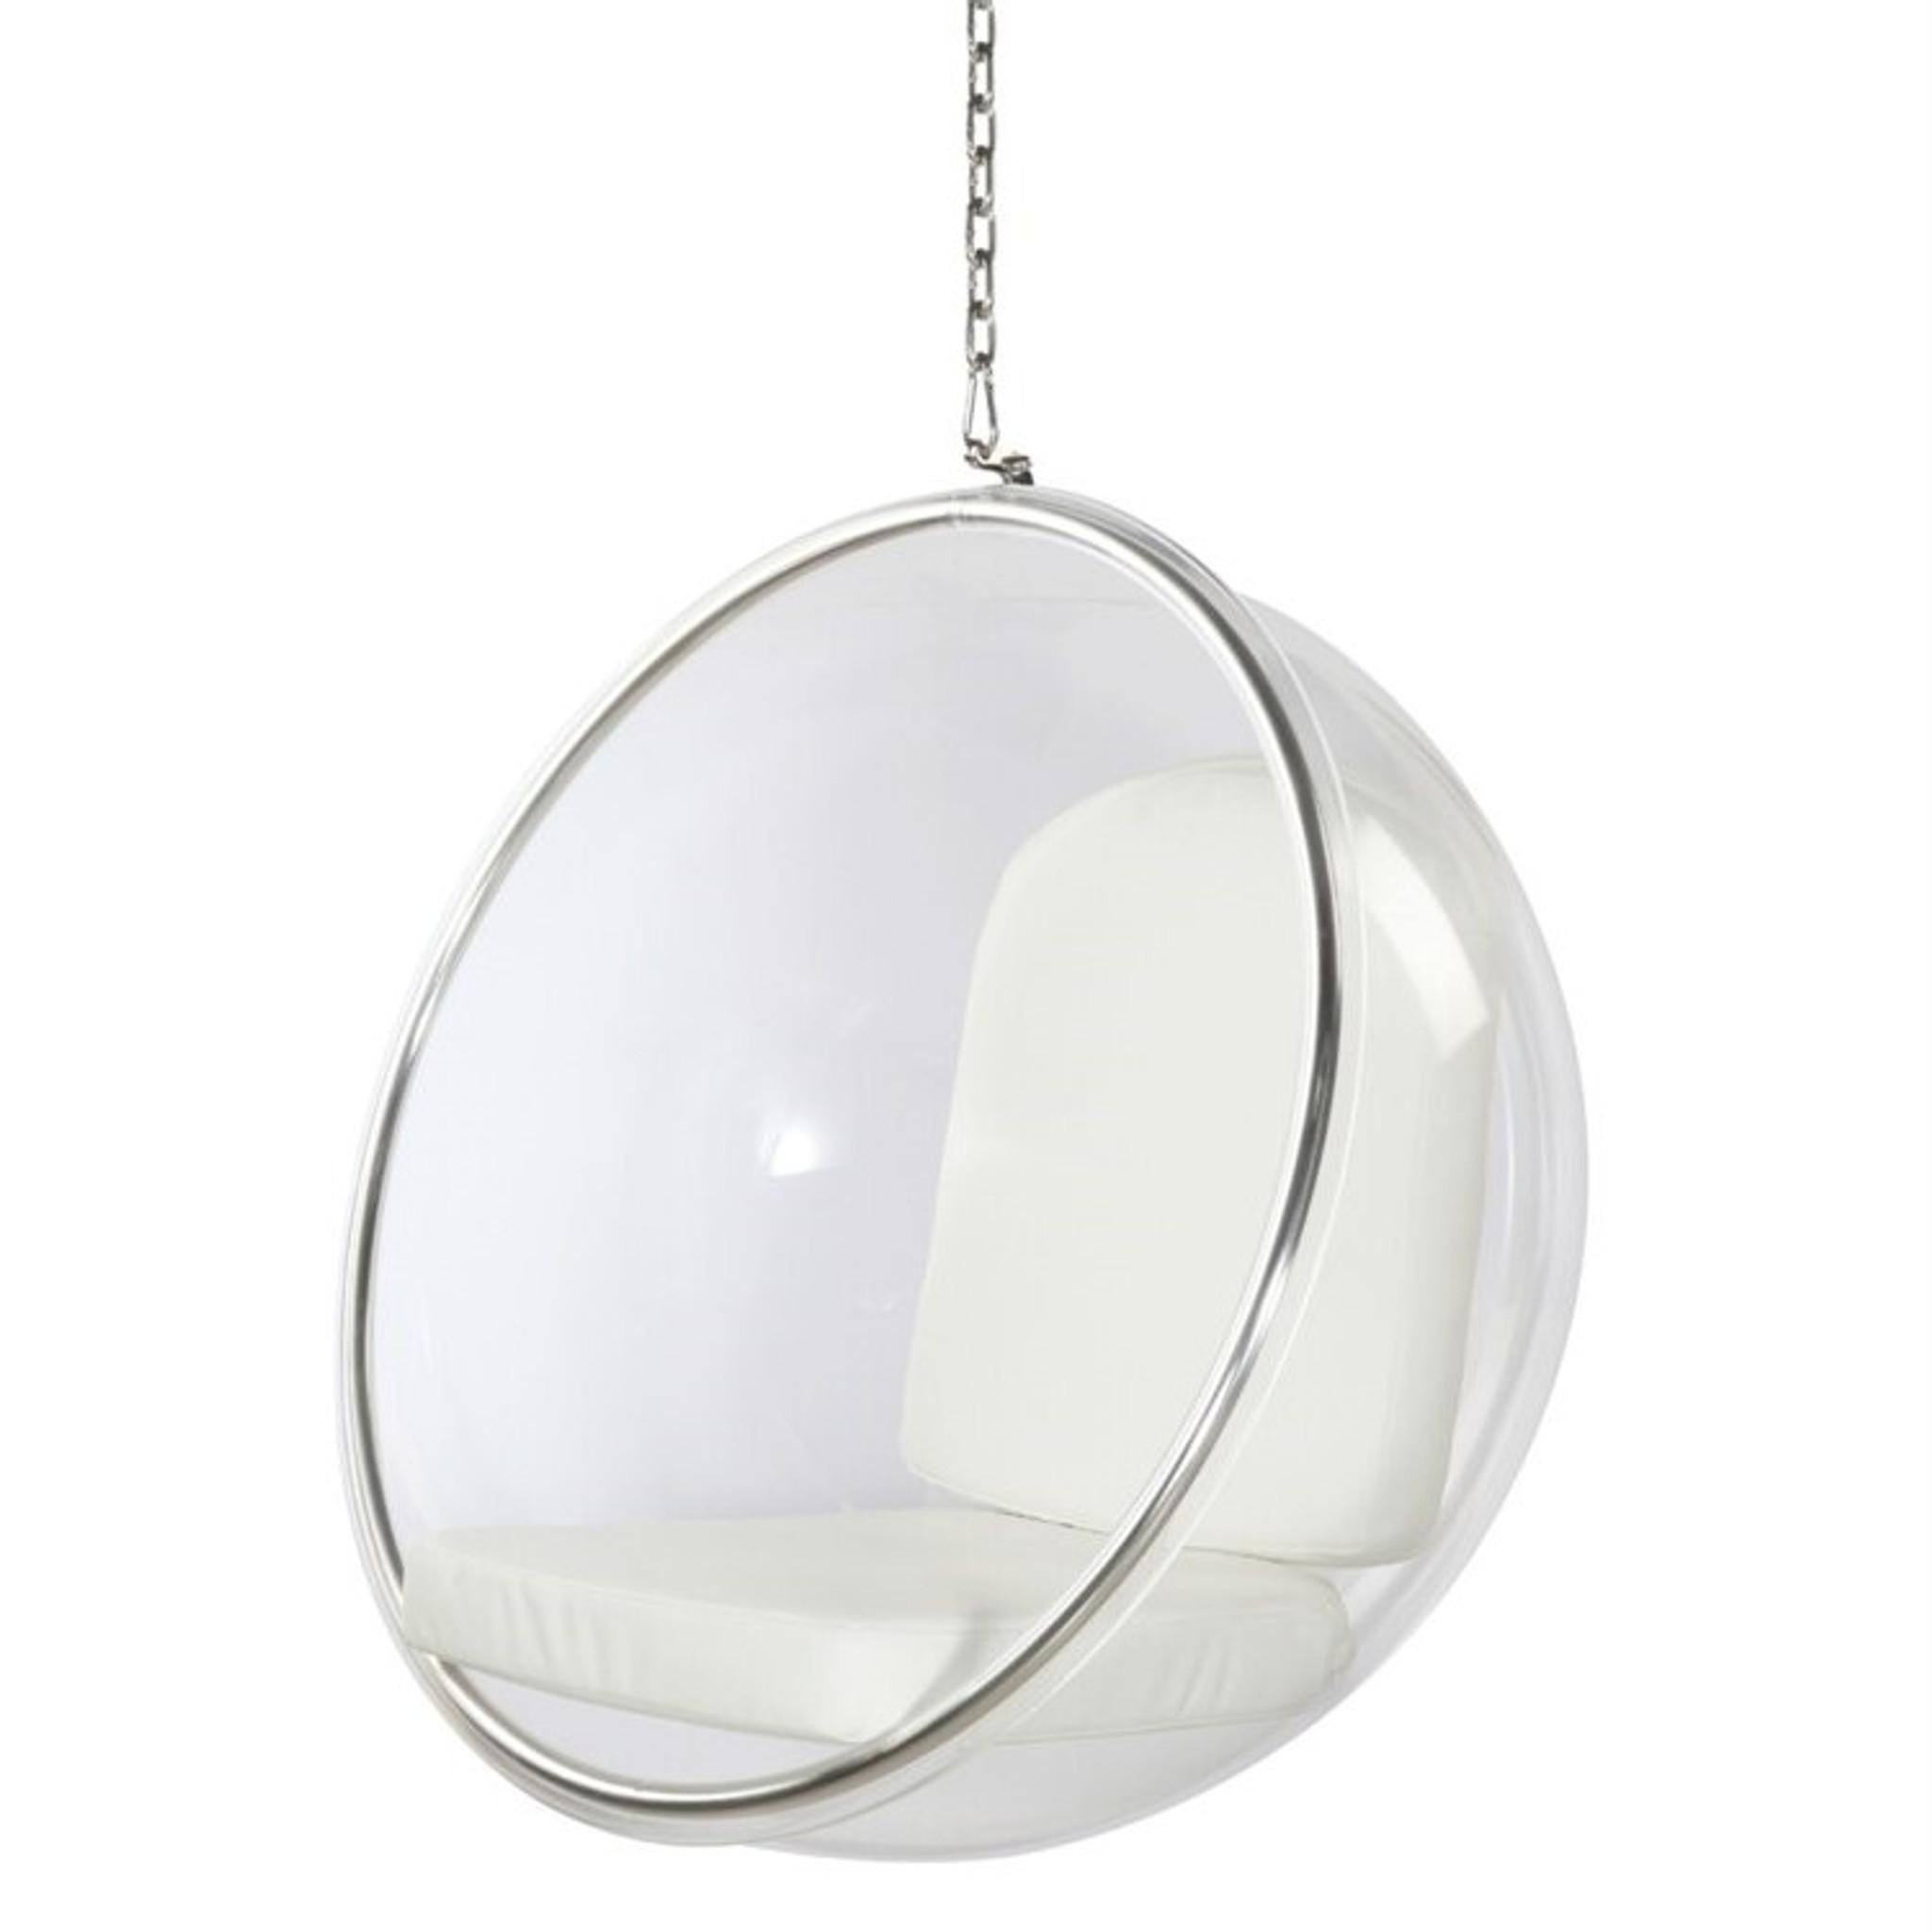 finemod  FMI1122 hanging clear bubble chair white cushion silver chain